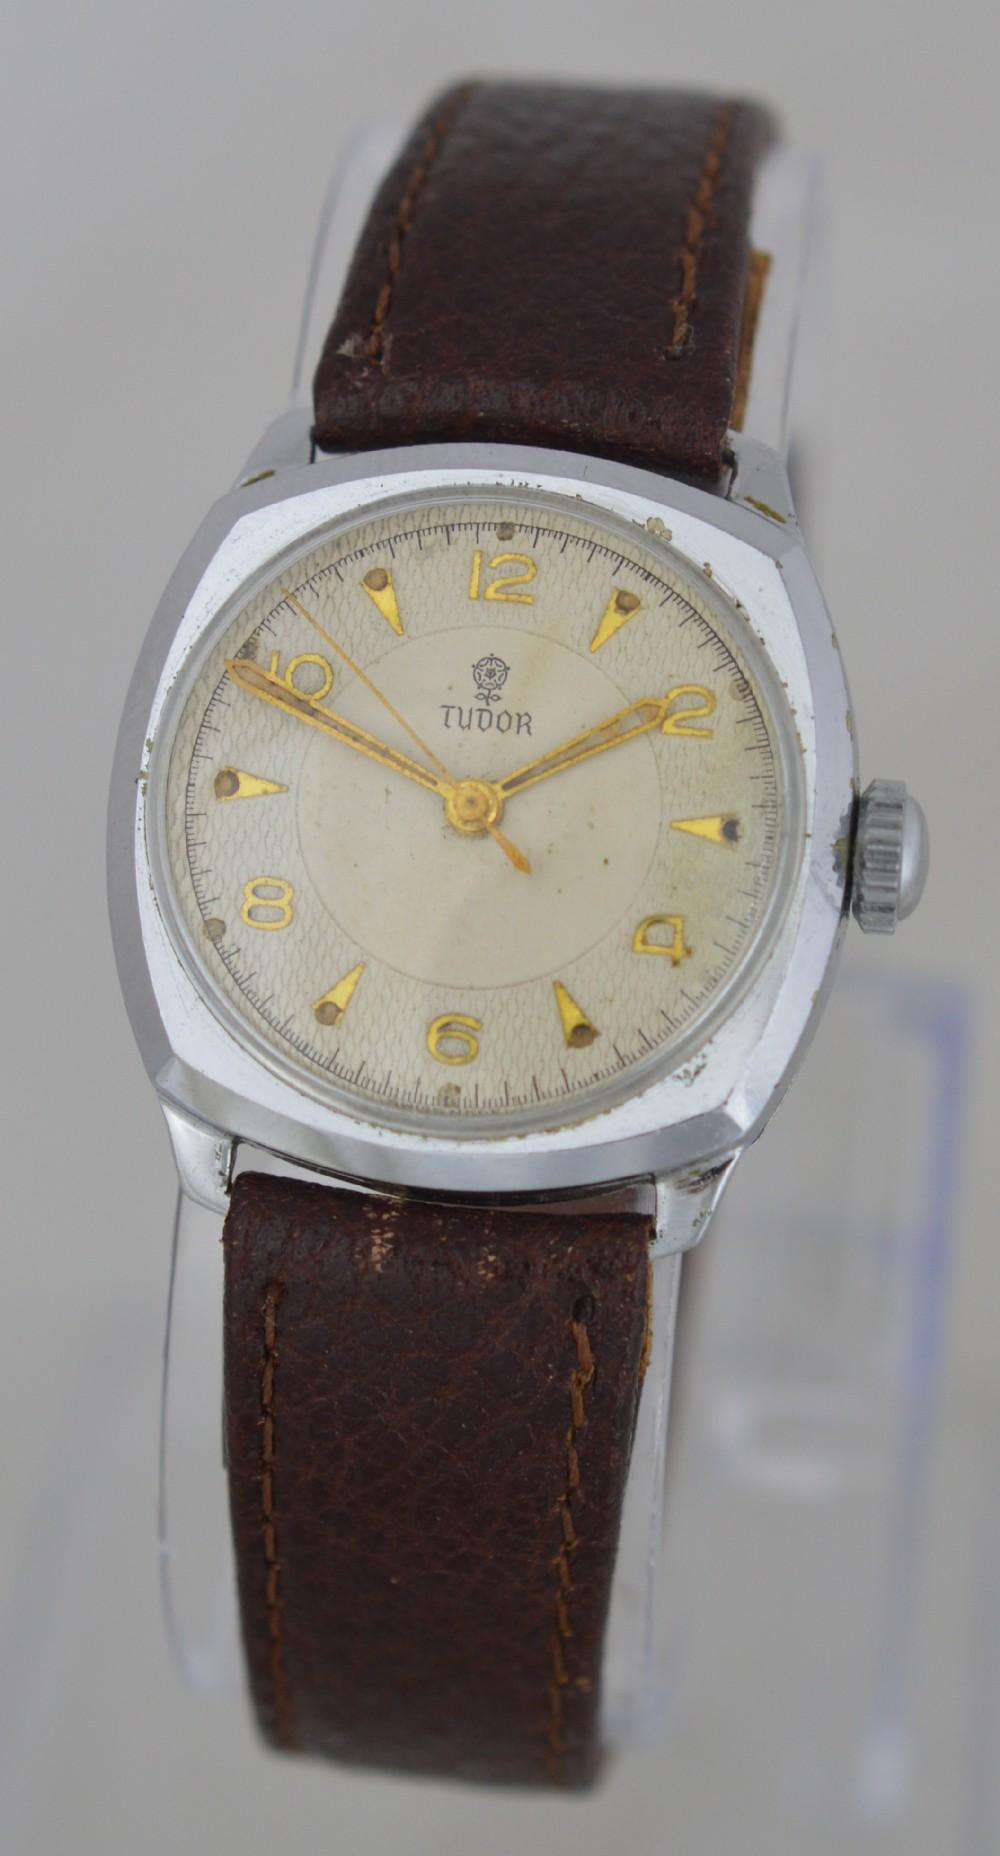 1950s tudor 'cushion' cased wristwatch